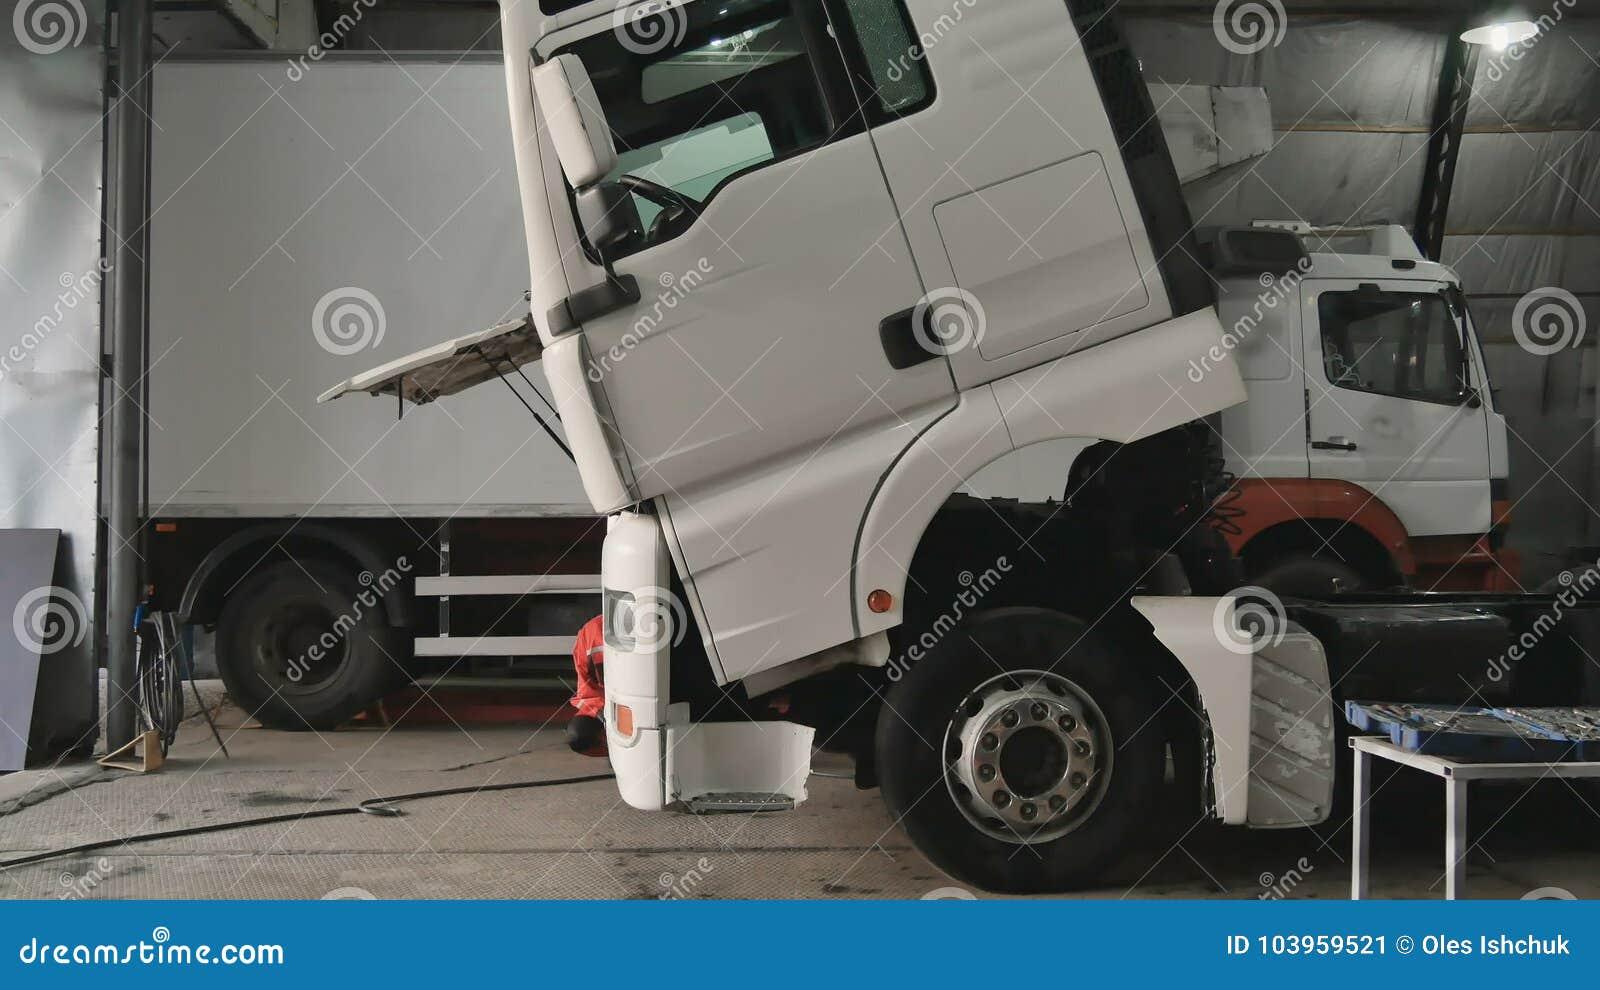 Mechanic tilting cabin of truck